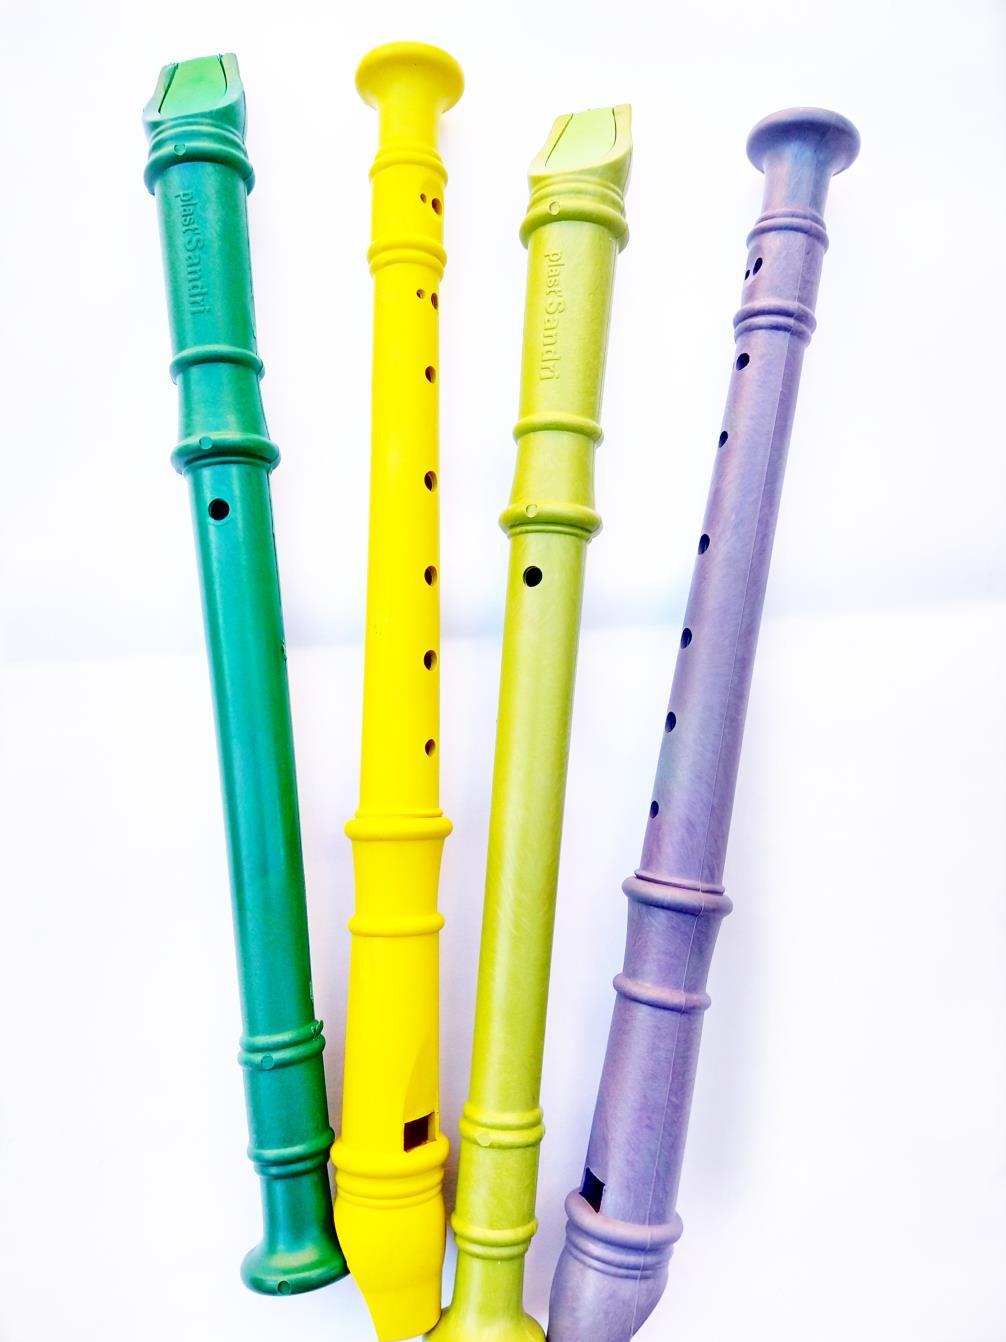 Flauta Doce Brinquedo Musical infantil